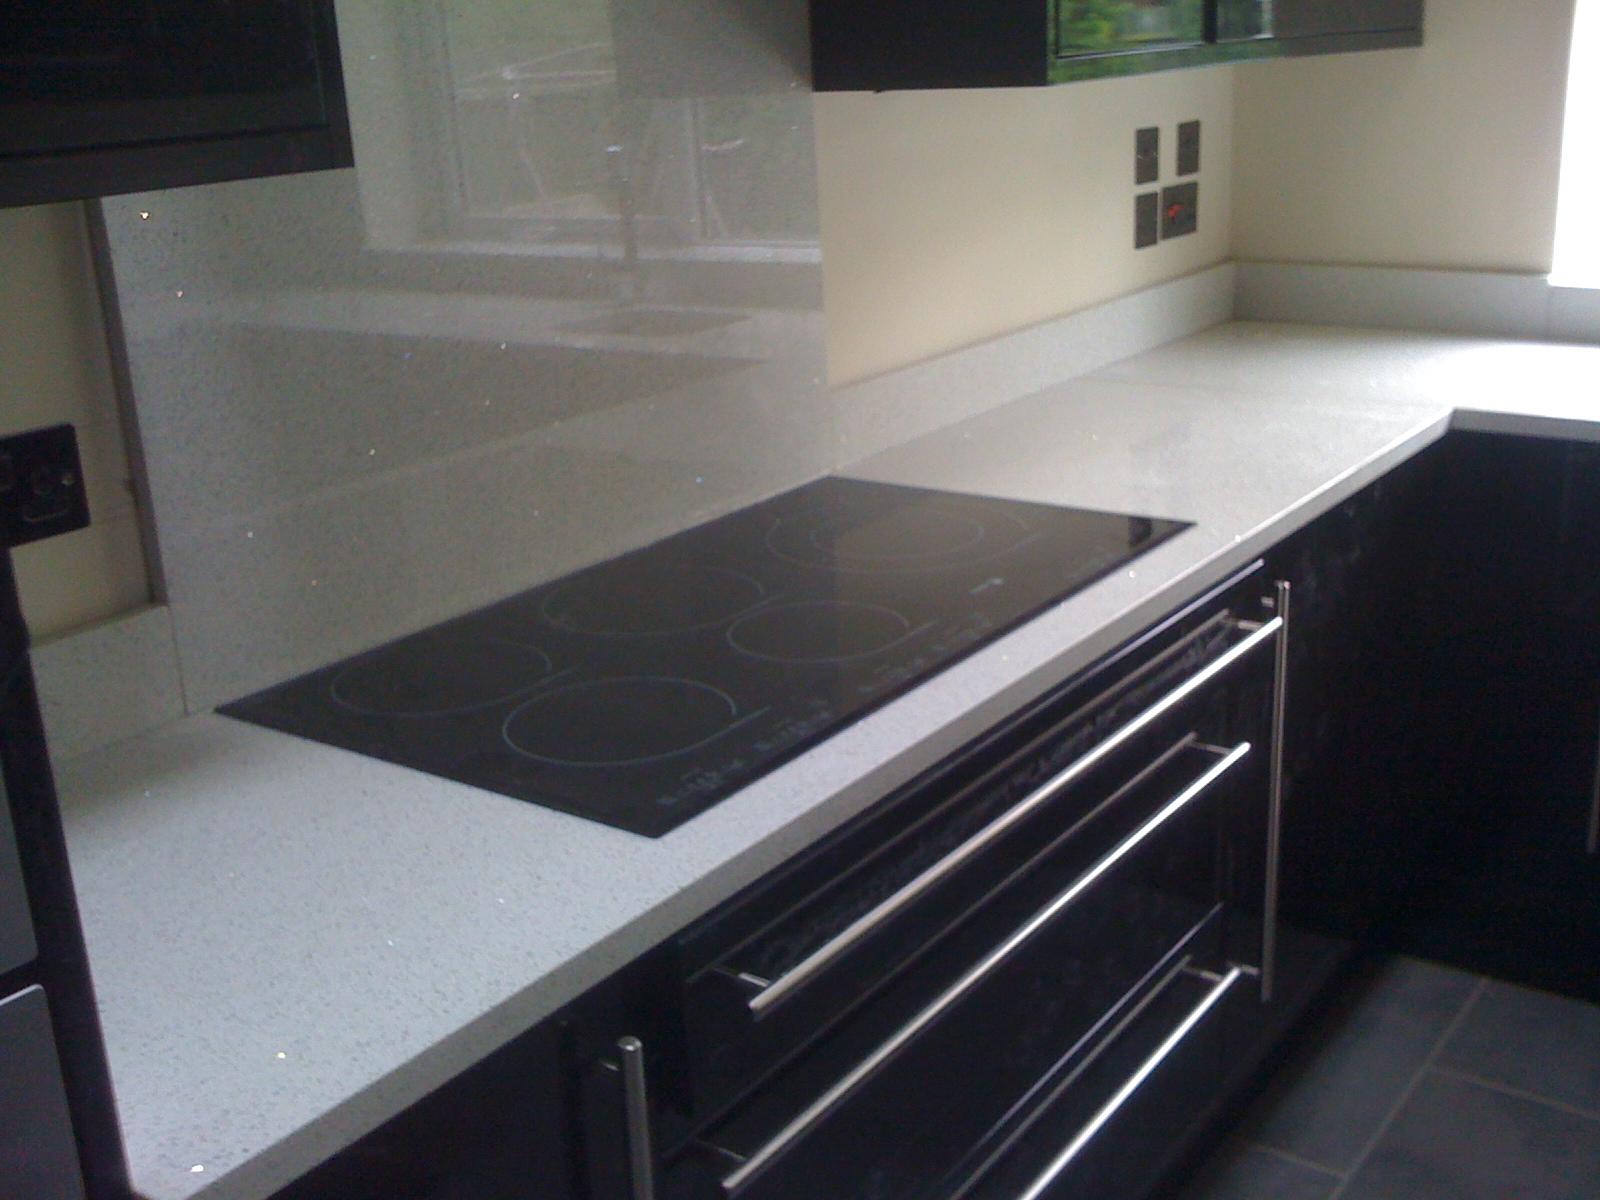 Whitton Worktops Bespoke Kitchen Worktops At Affordable